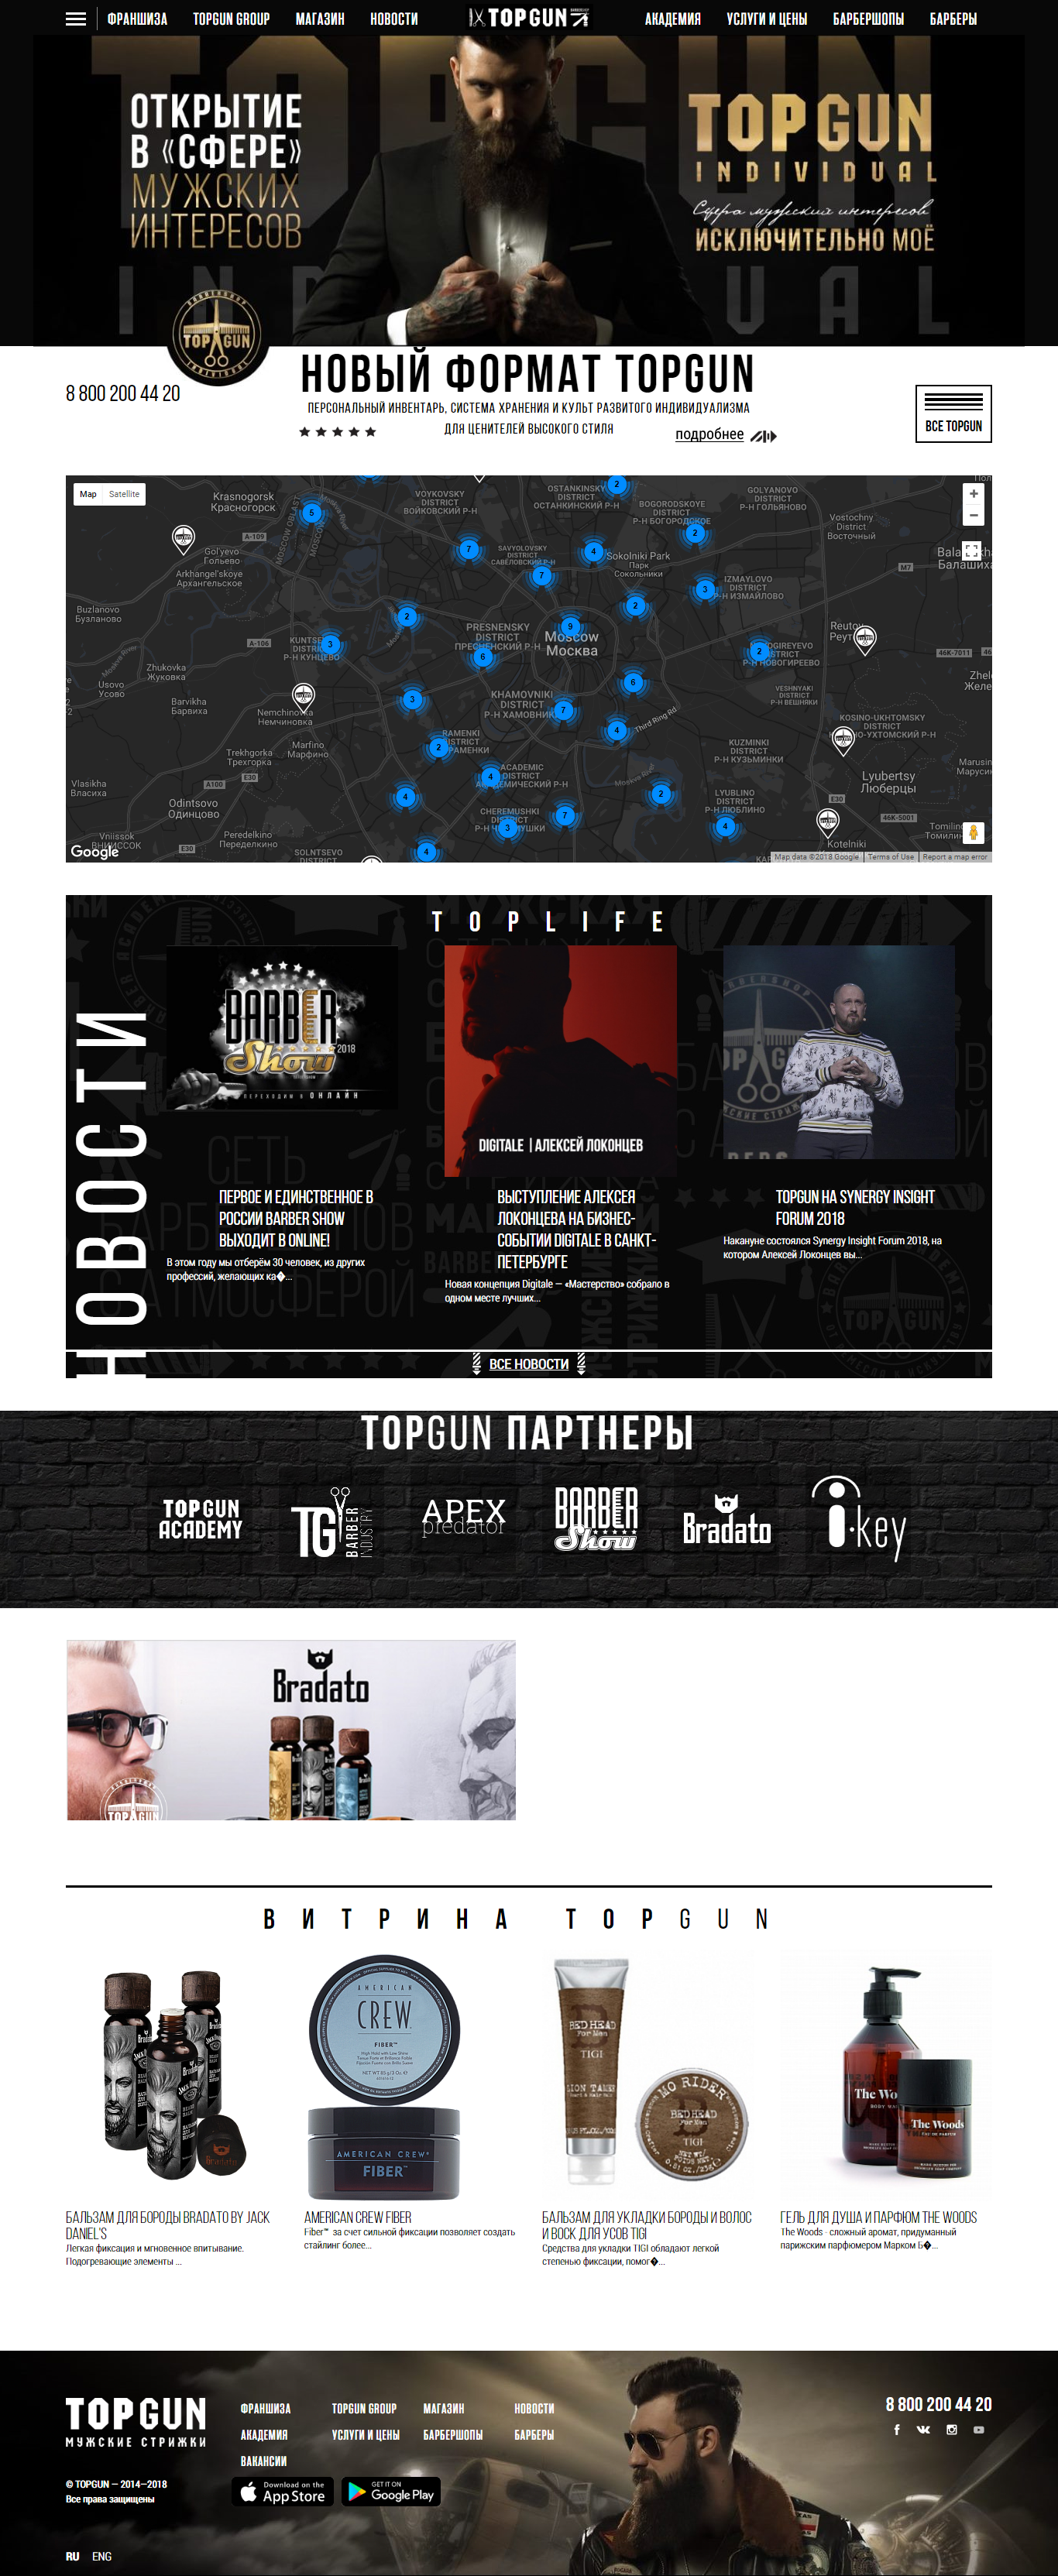 Website: http://topgunbarbershop.ru/. Date of access: 06/09/2018